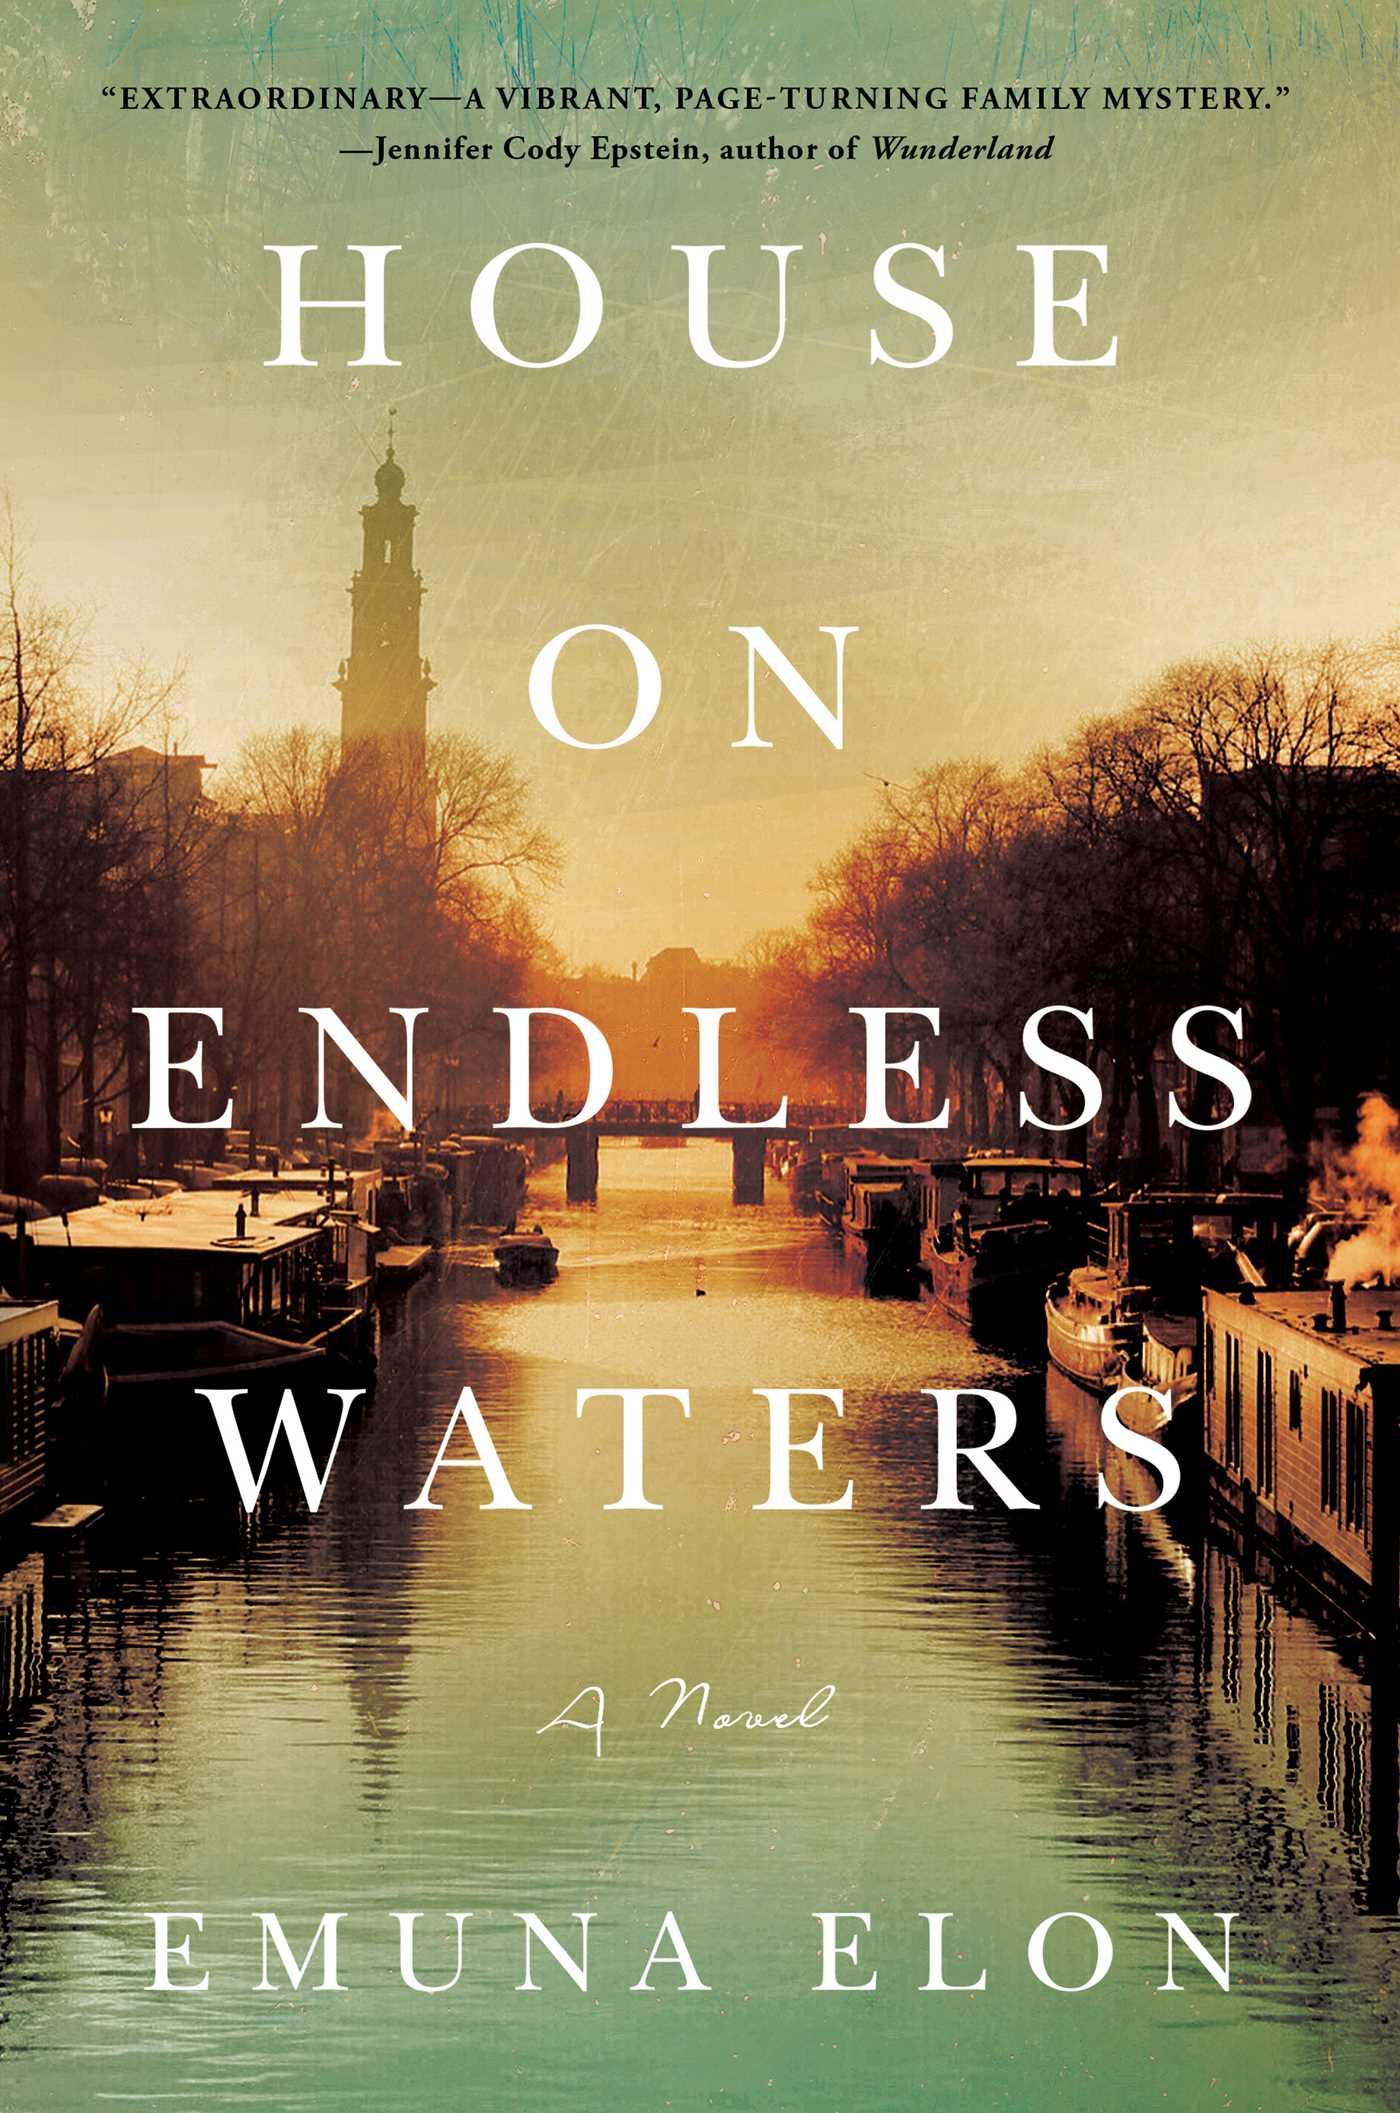 House on Endless Waters - Emuna Elon